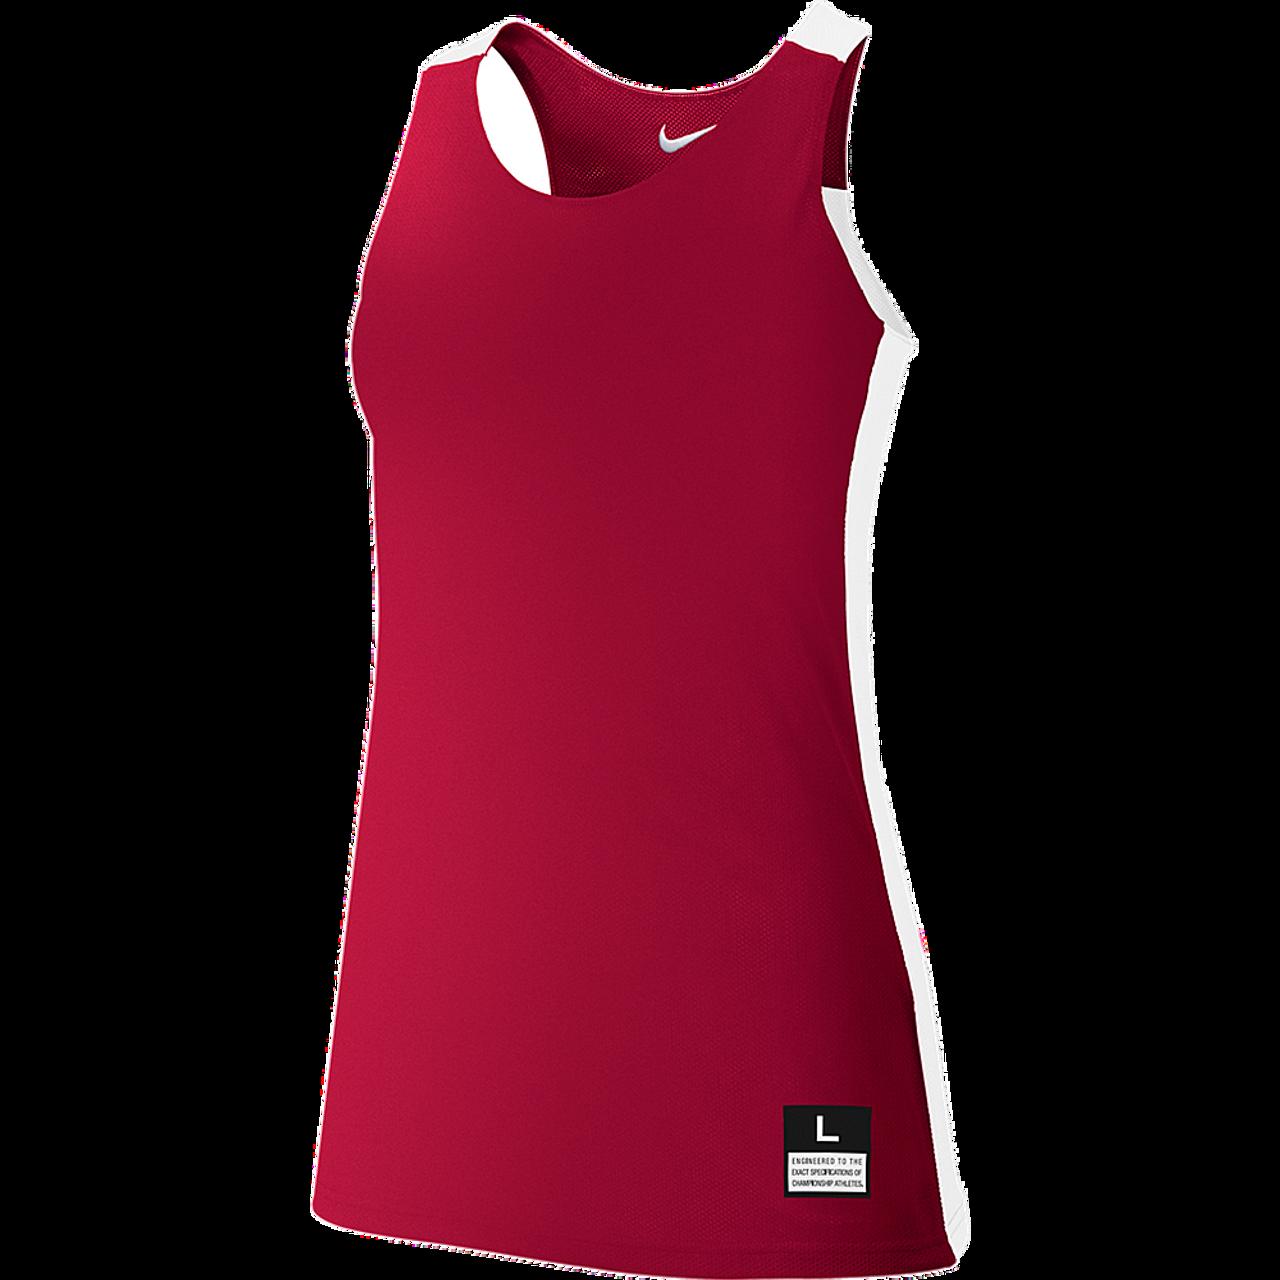 98459eb6385d Nike Womens League Reversible Tank - Scarlet White - Athlete Performance  Solutions EU